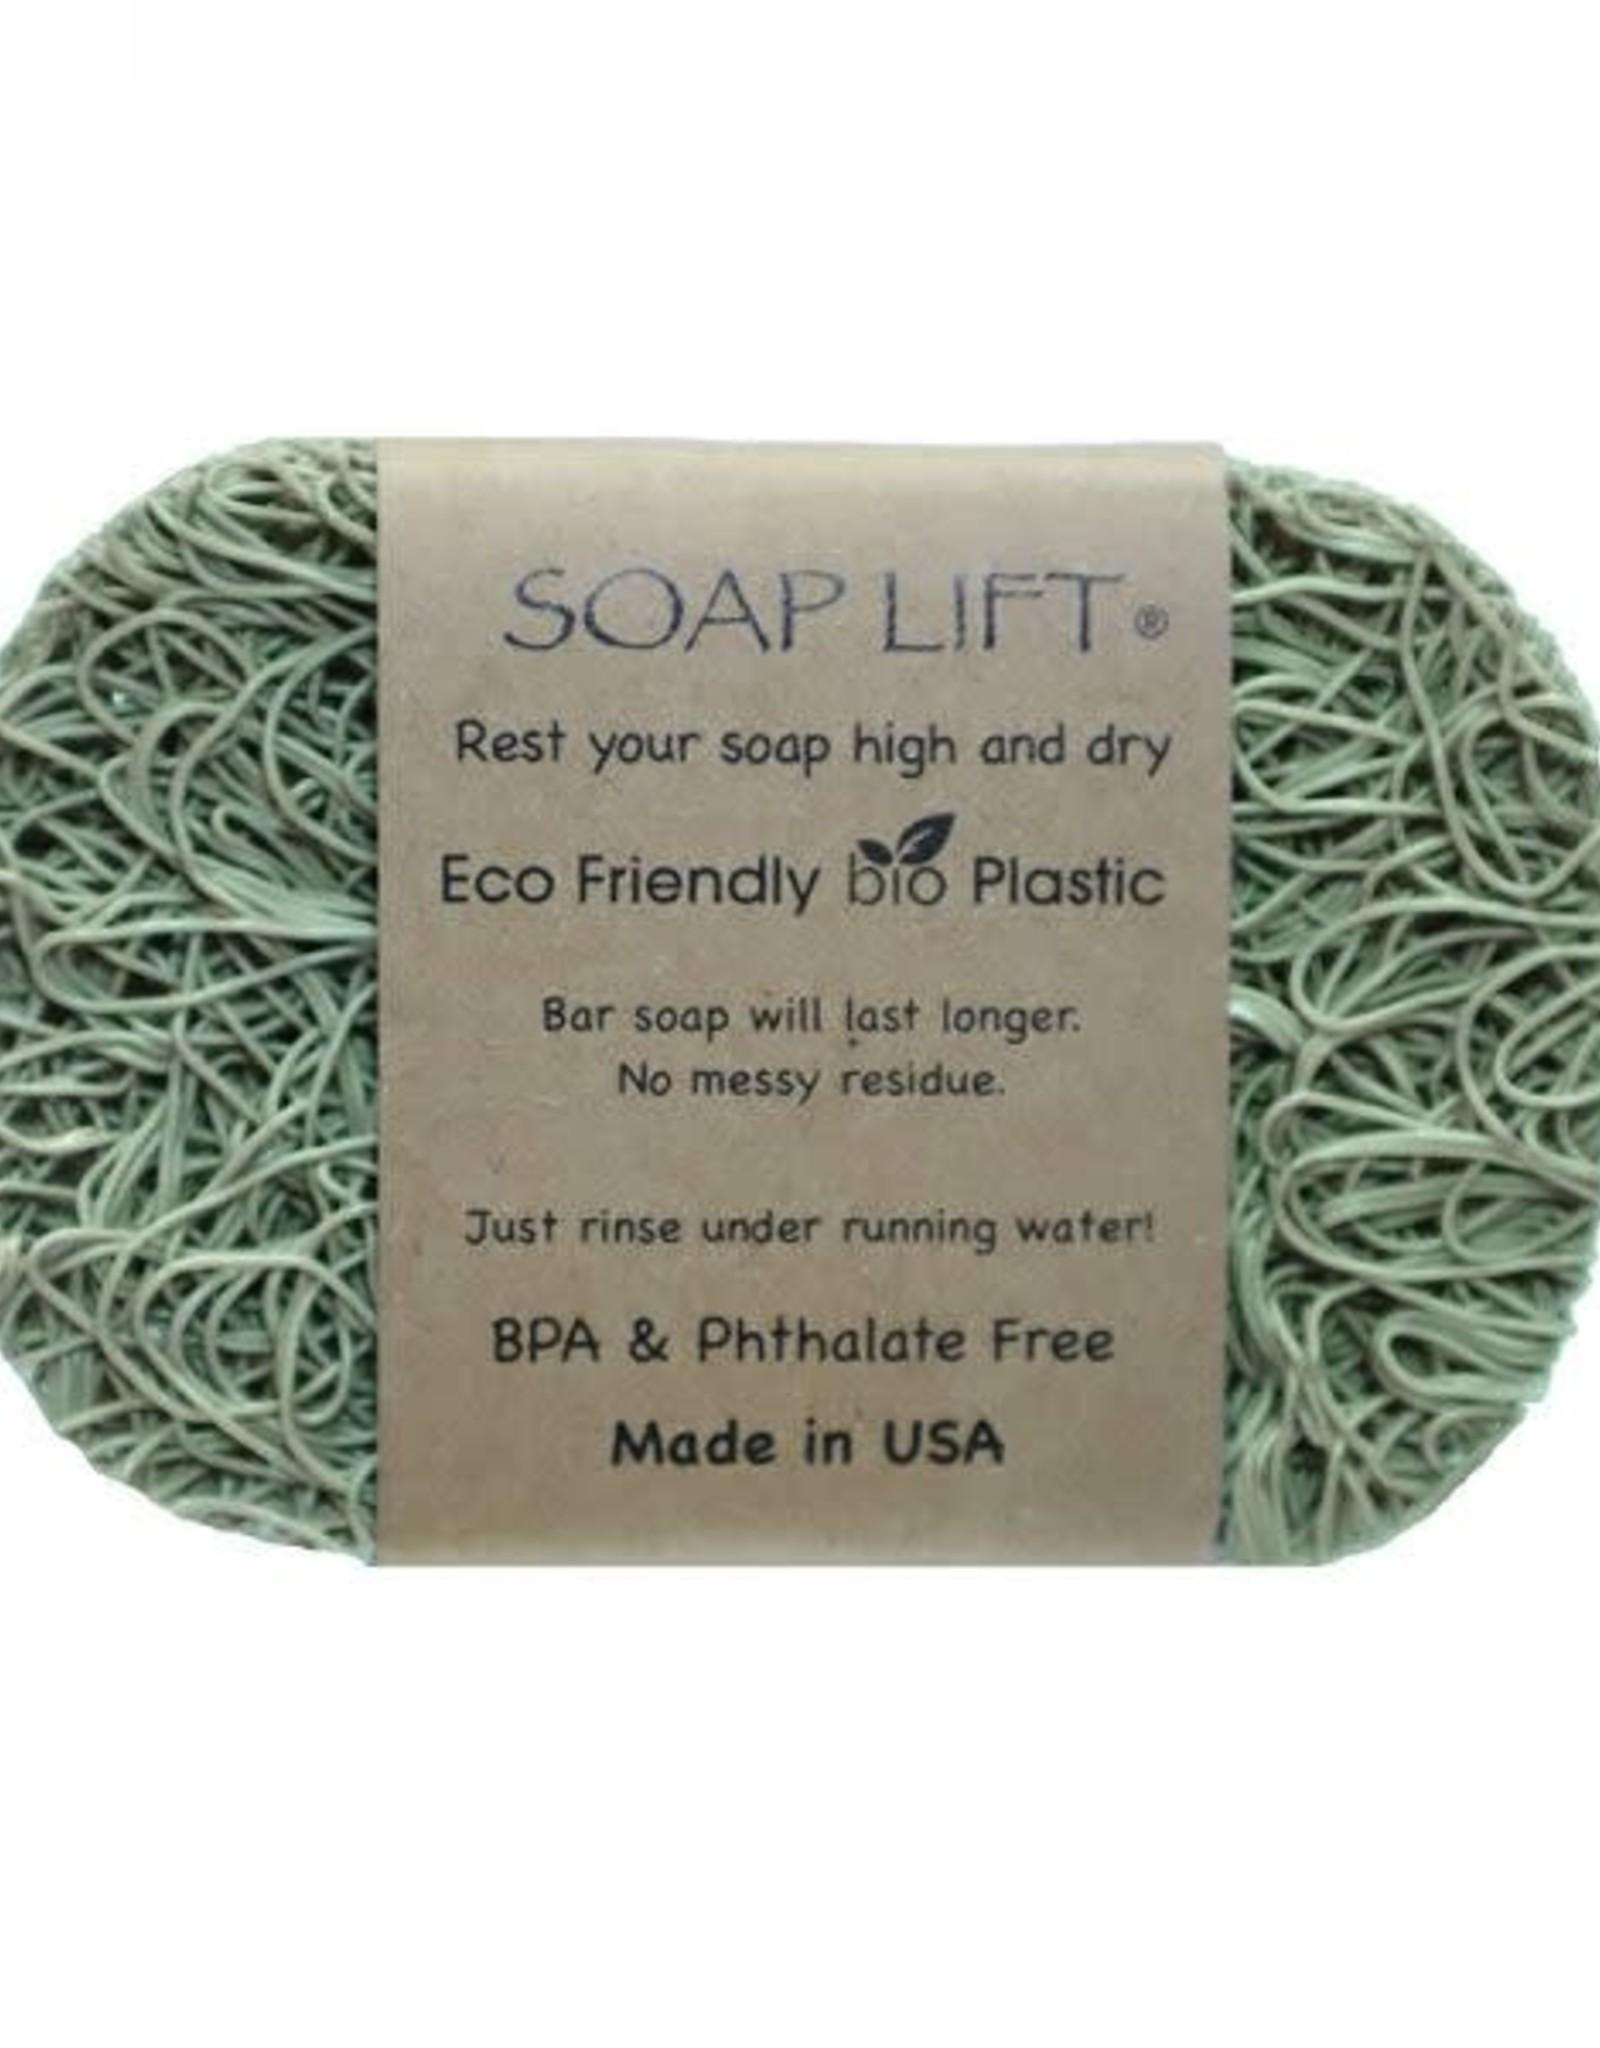 Soap Lift Eco Friendly Soap 'Lift'